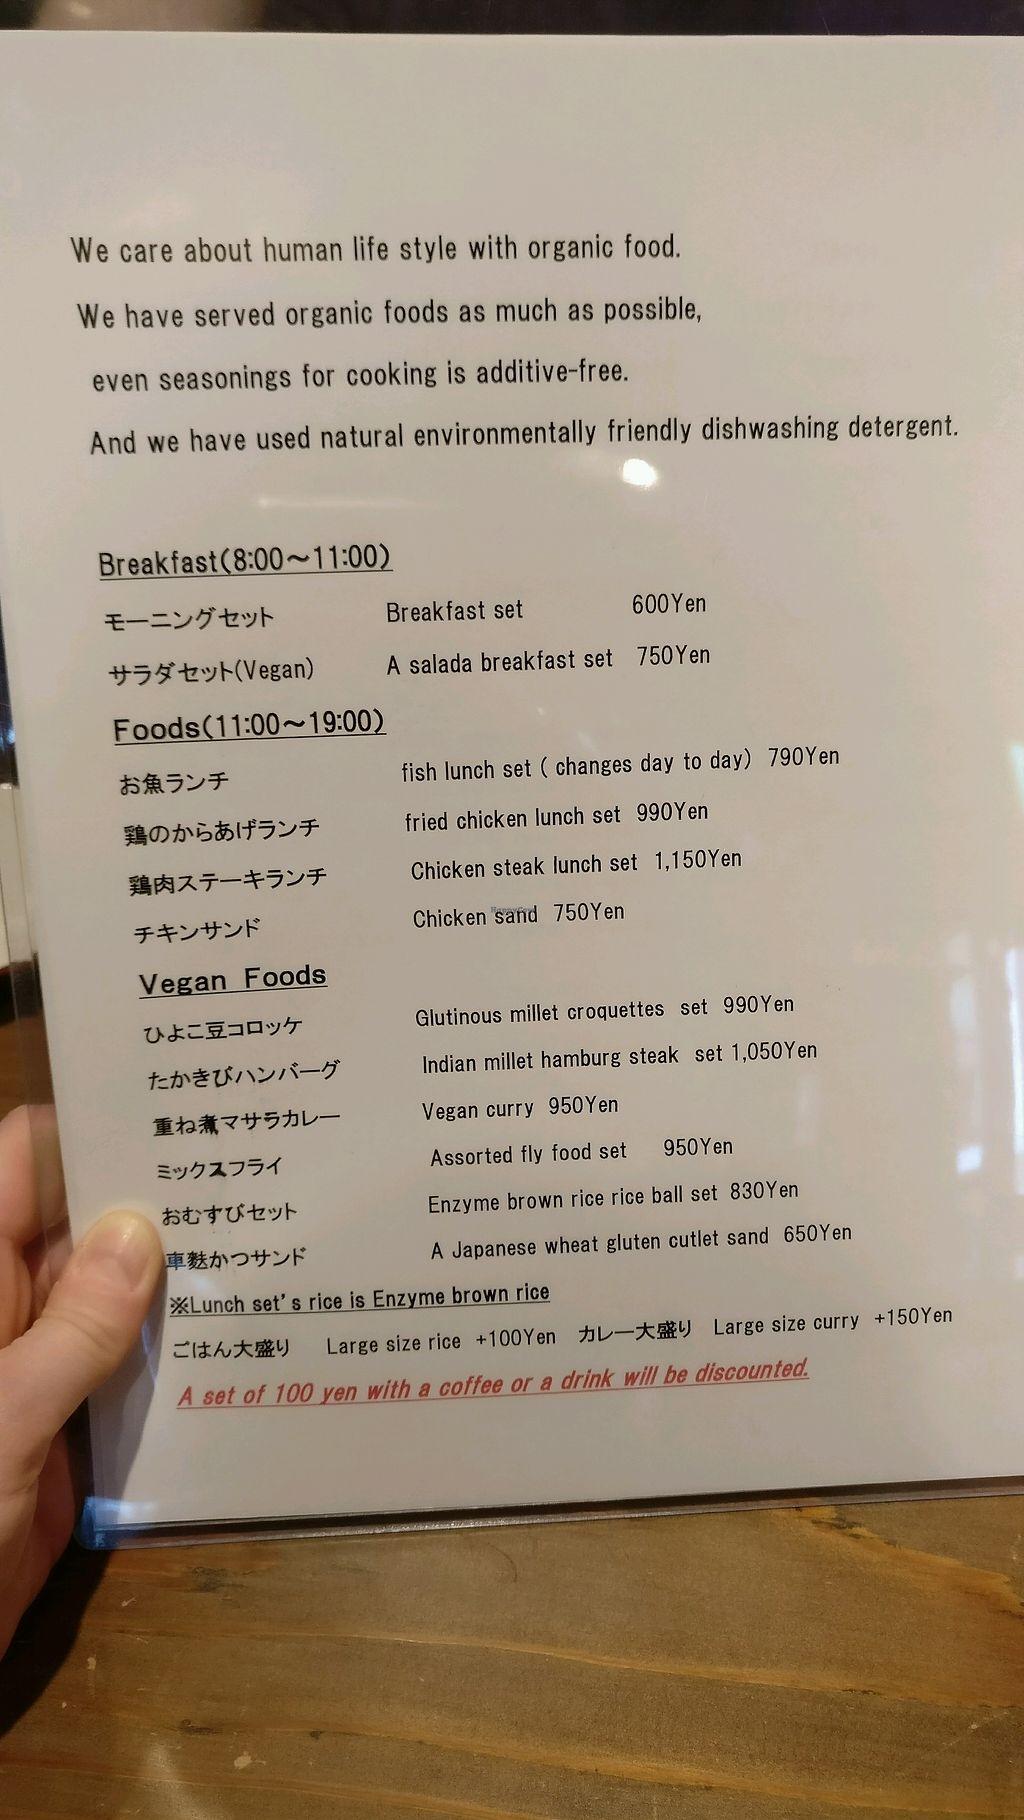 "Photo of Kissasaeki  by <a href=""/members/profile/Zimzam"">Zimzam</a> <br/>Food menu <br/> October 4, 2017  - <a href='/contact/abuse/image/75670/311564'>Report</a>"